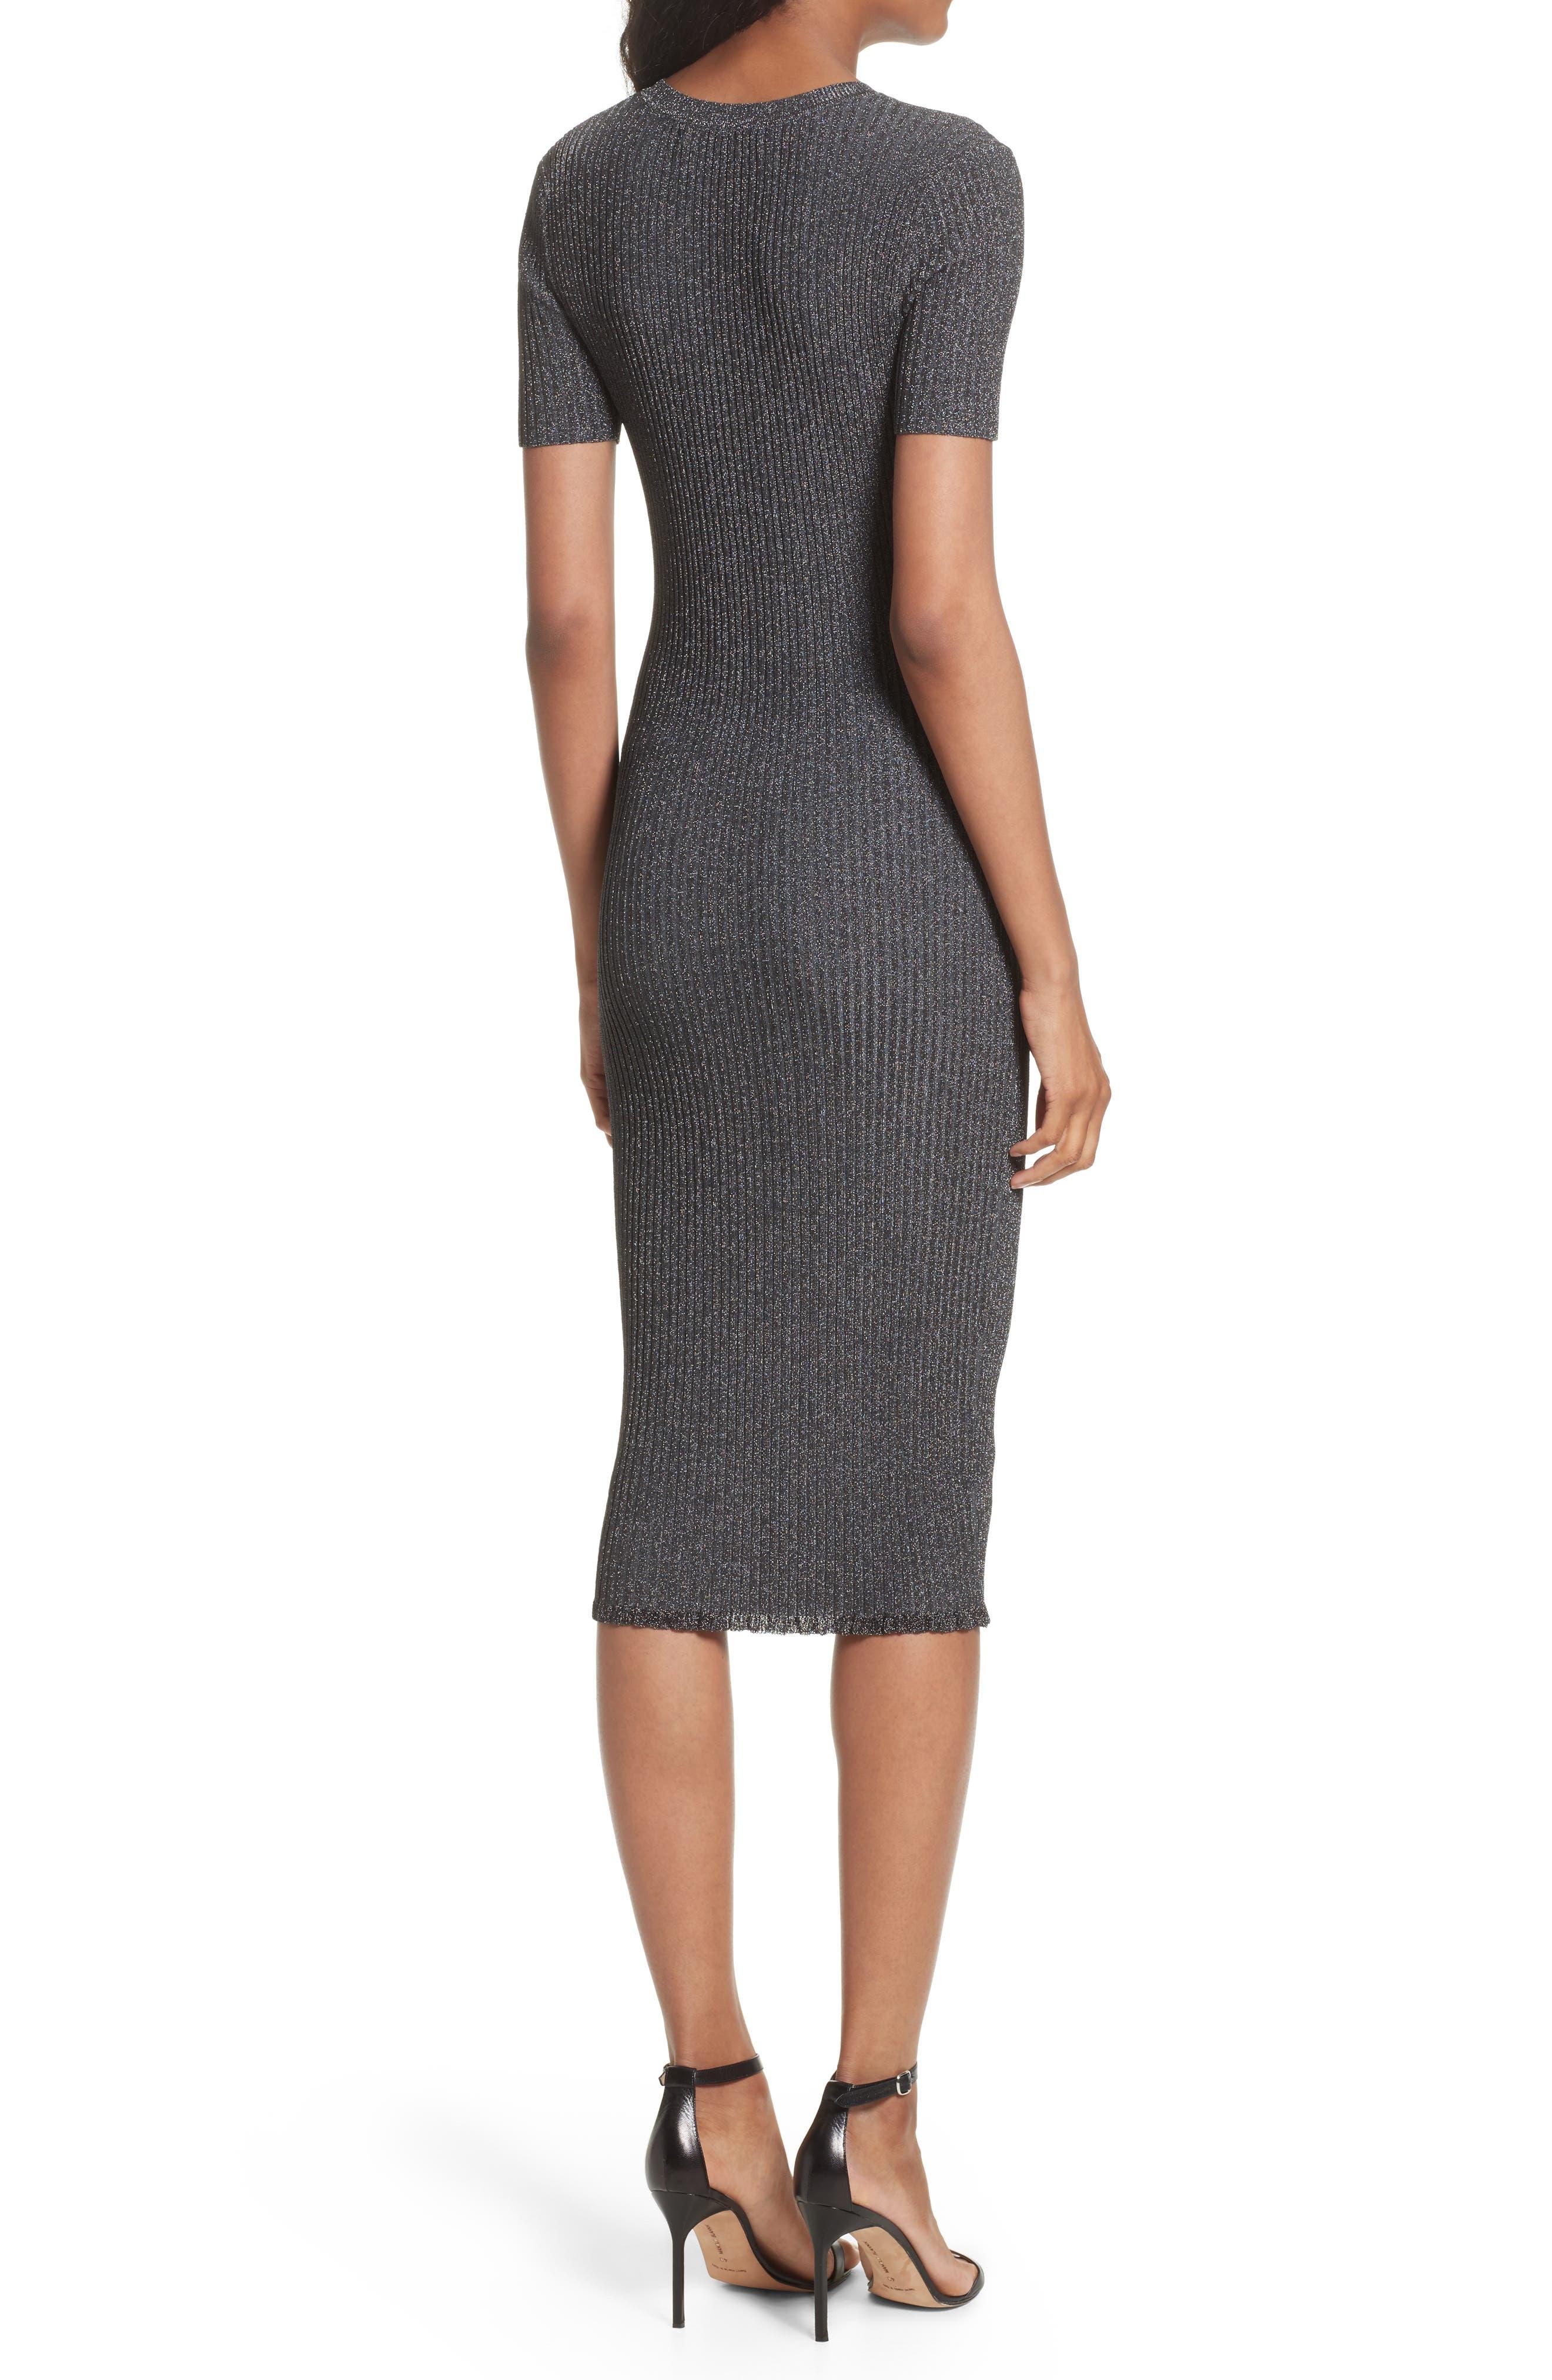 Stardust Rib Knit Sheath Dress,                             Alternate thumbnail 2, color,                             022